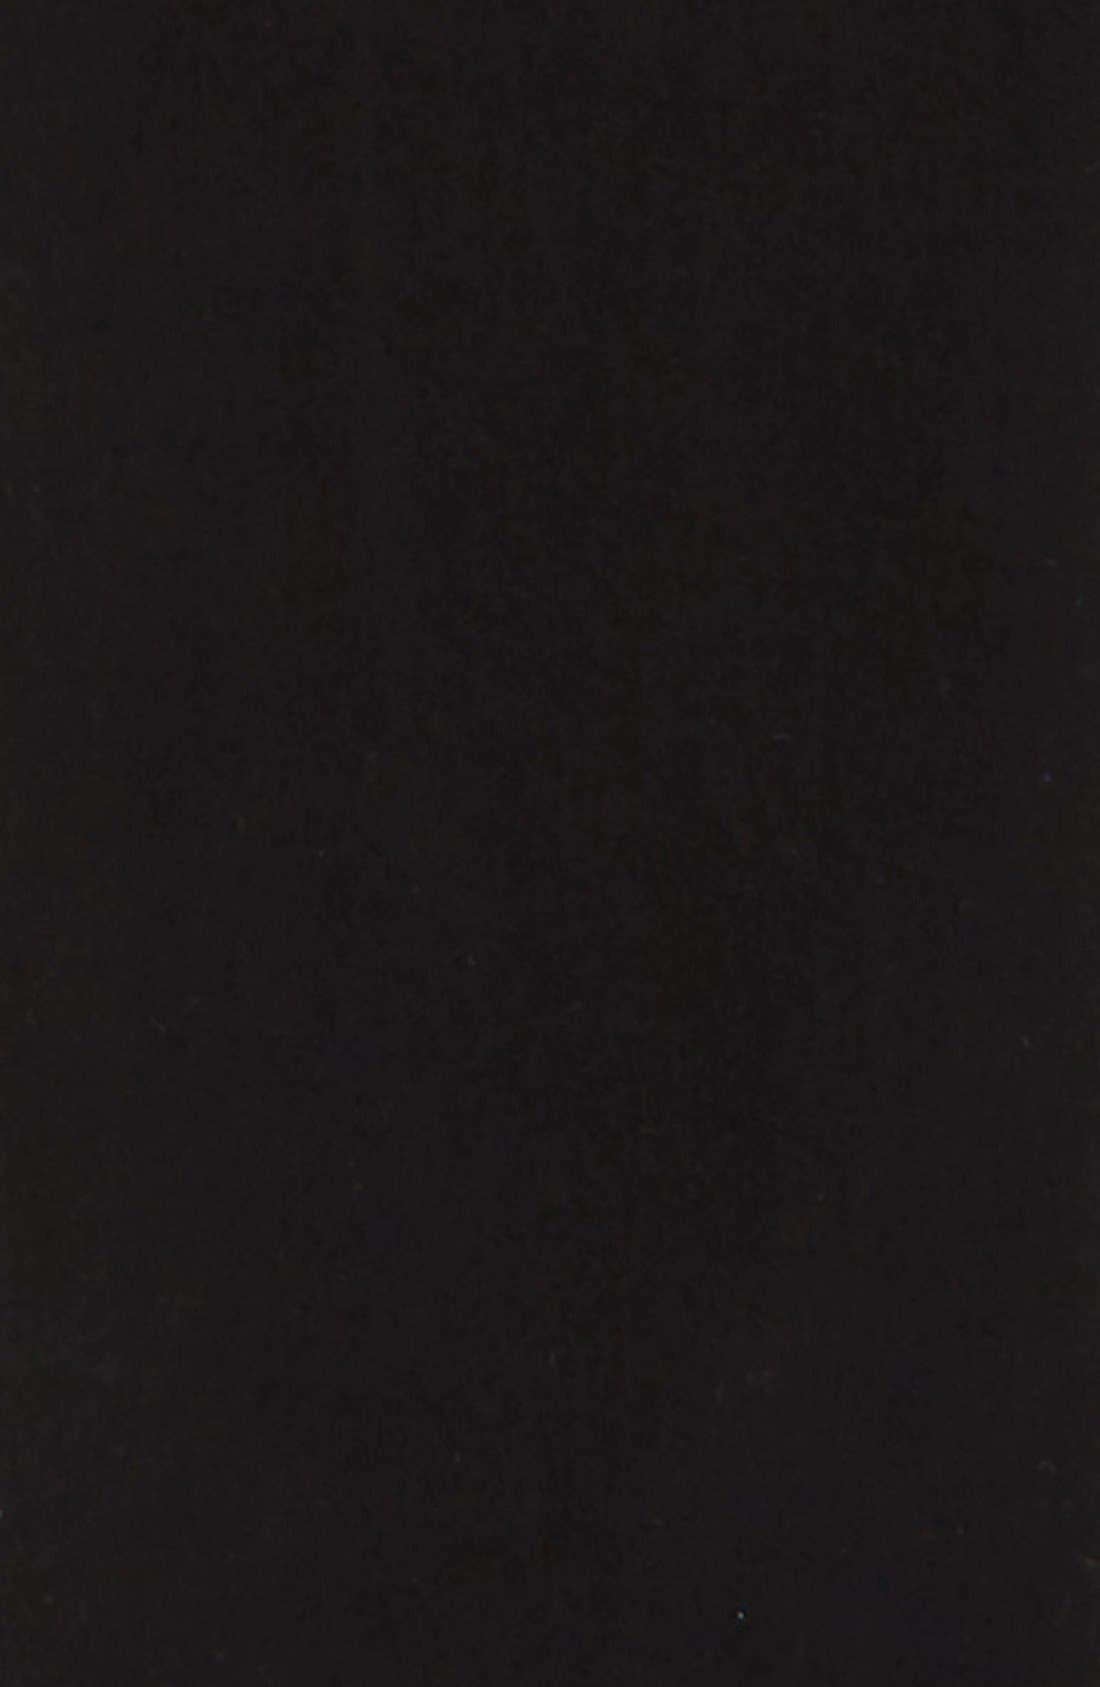 Slim Fit Stretch Chinos,                             Alternate thumbnail 6, color,                             BLACK